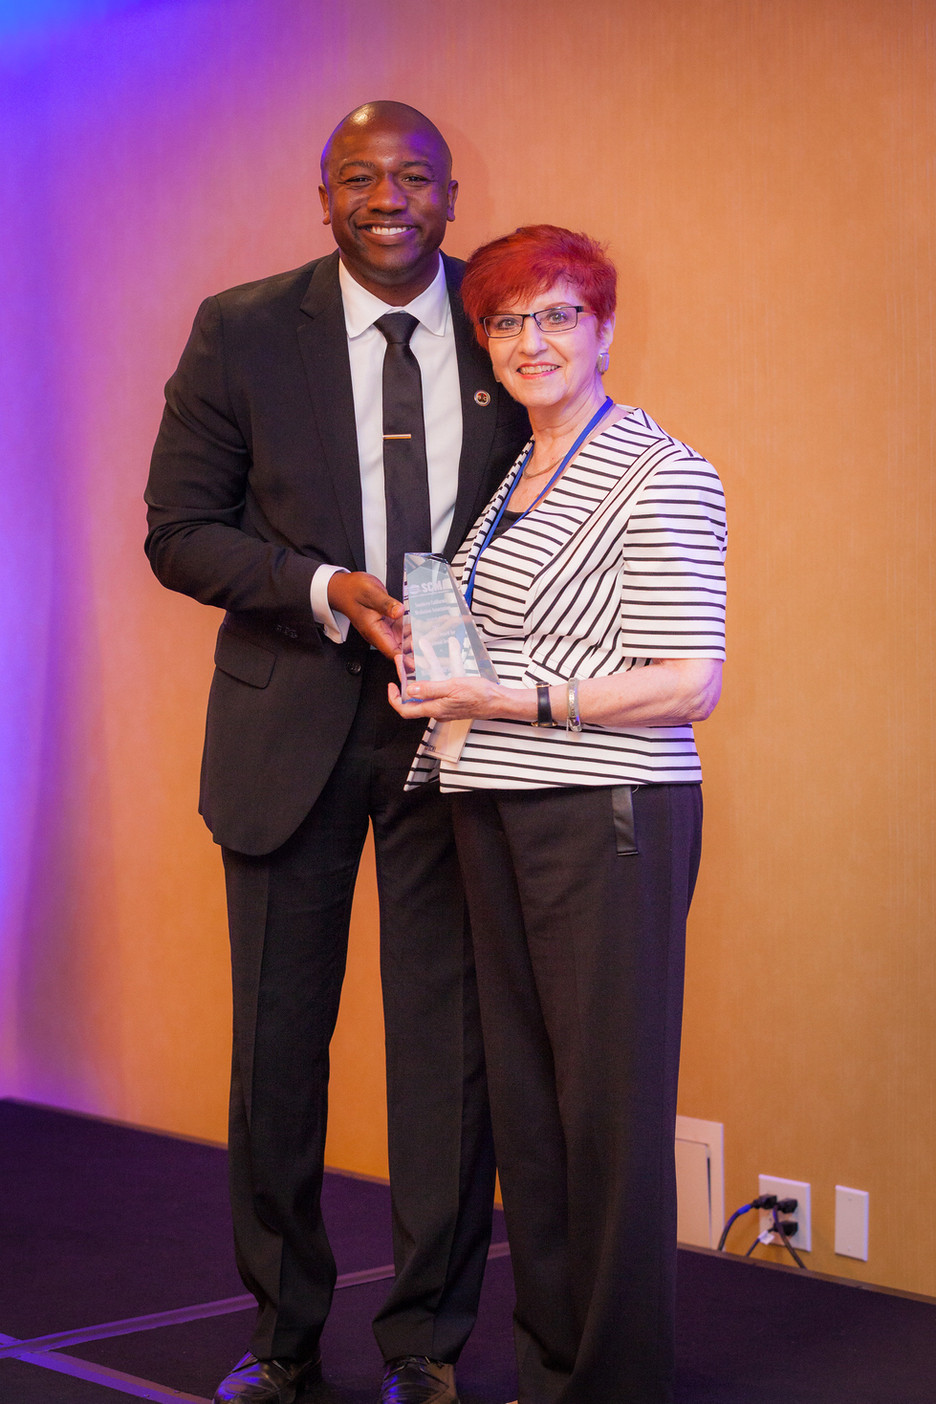 Foundation Board Chair Receives SCMA President's Award